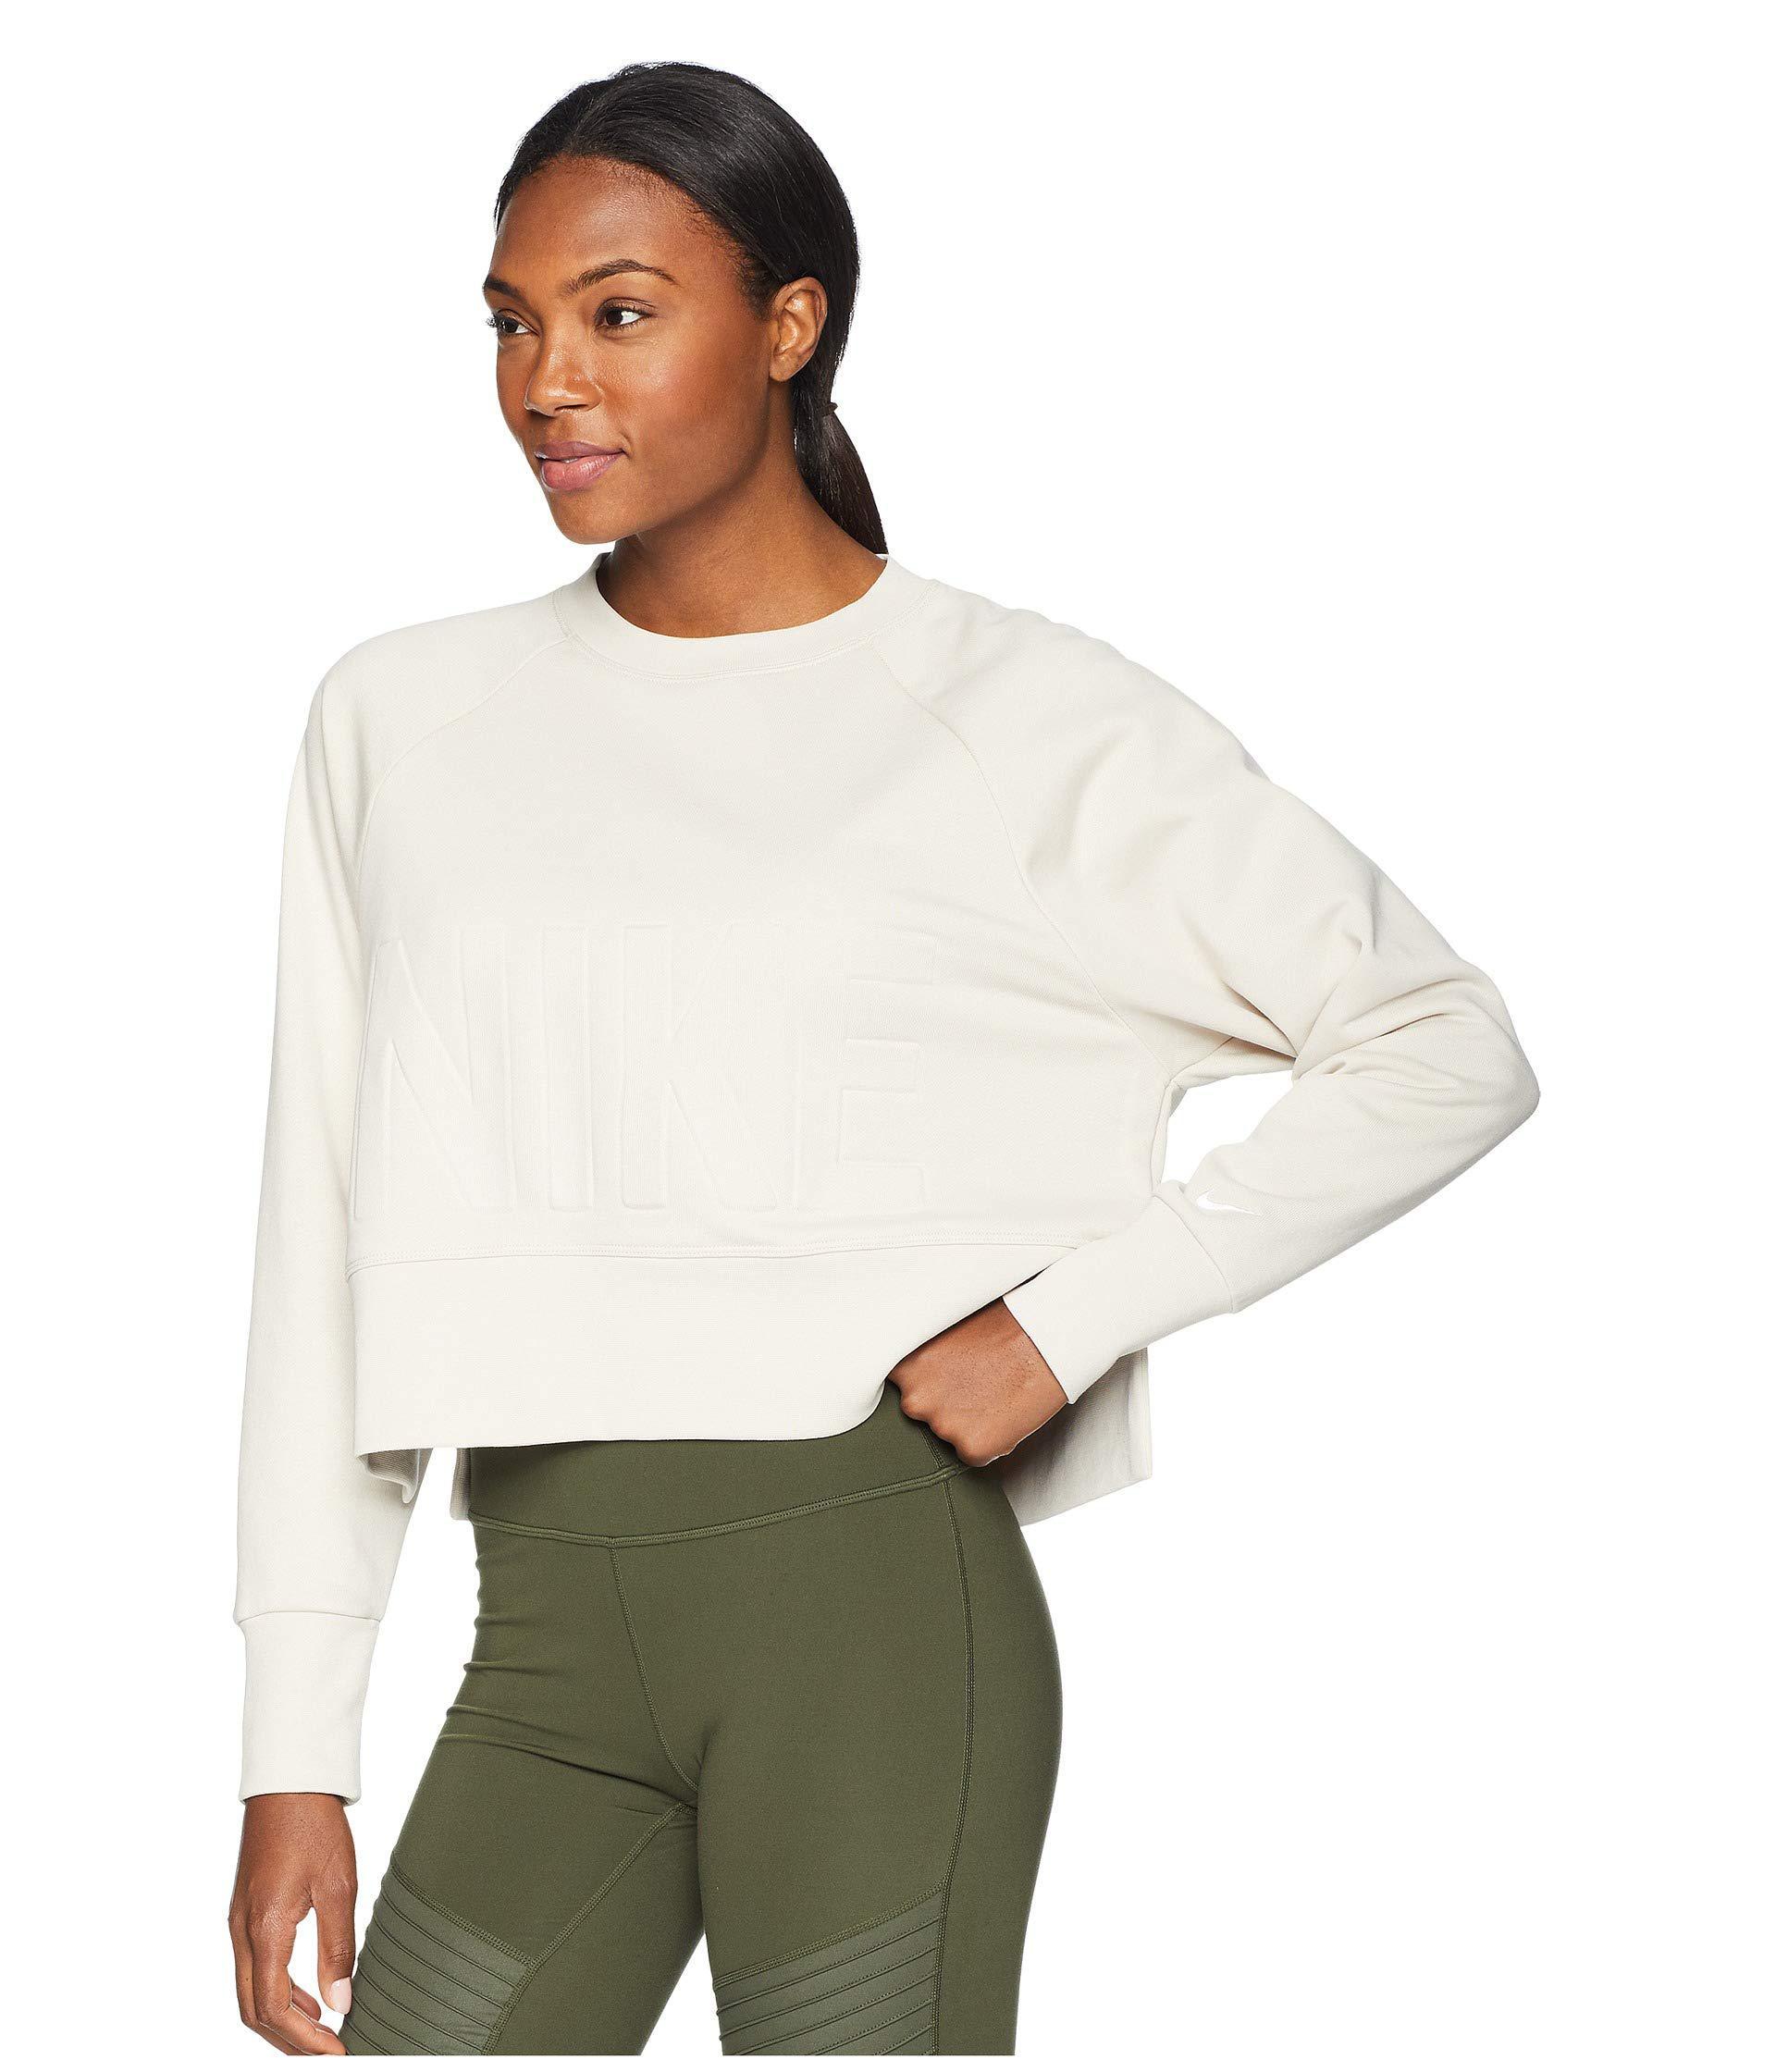 b4f8e0caba2921 Lyst - Nike Versa Crew Top (desert Sand white) Women s Long Sleeve ...